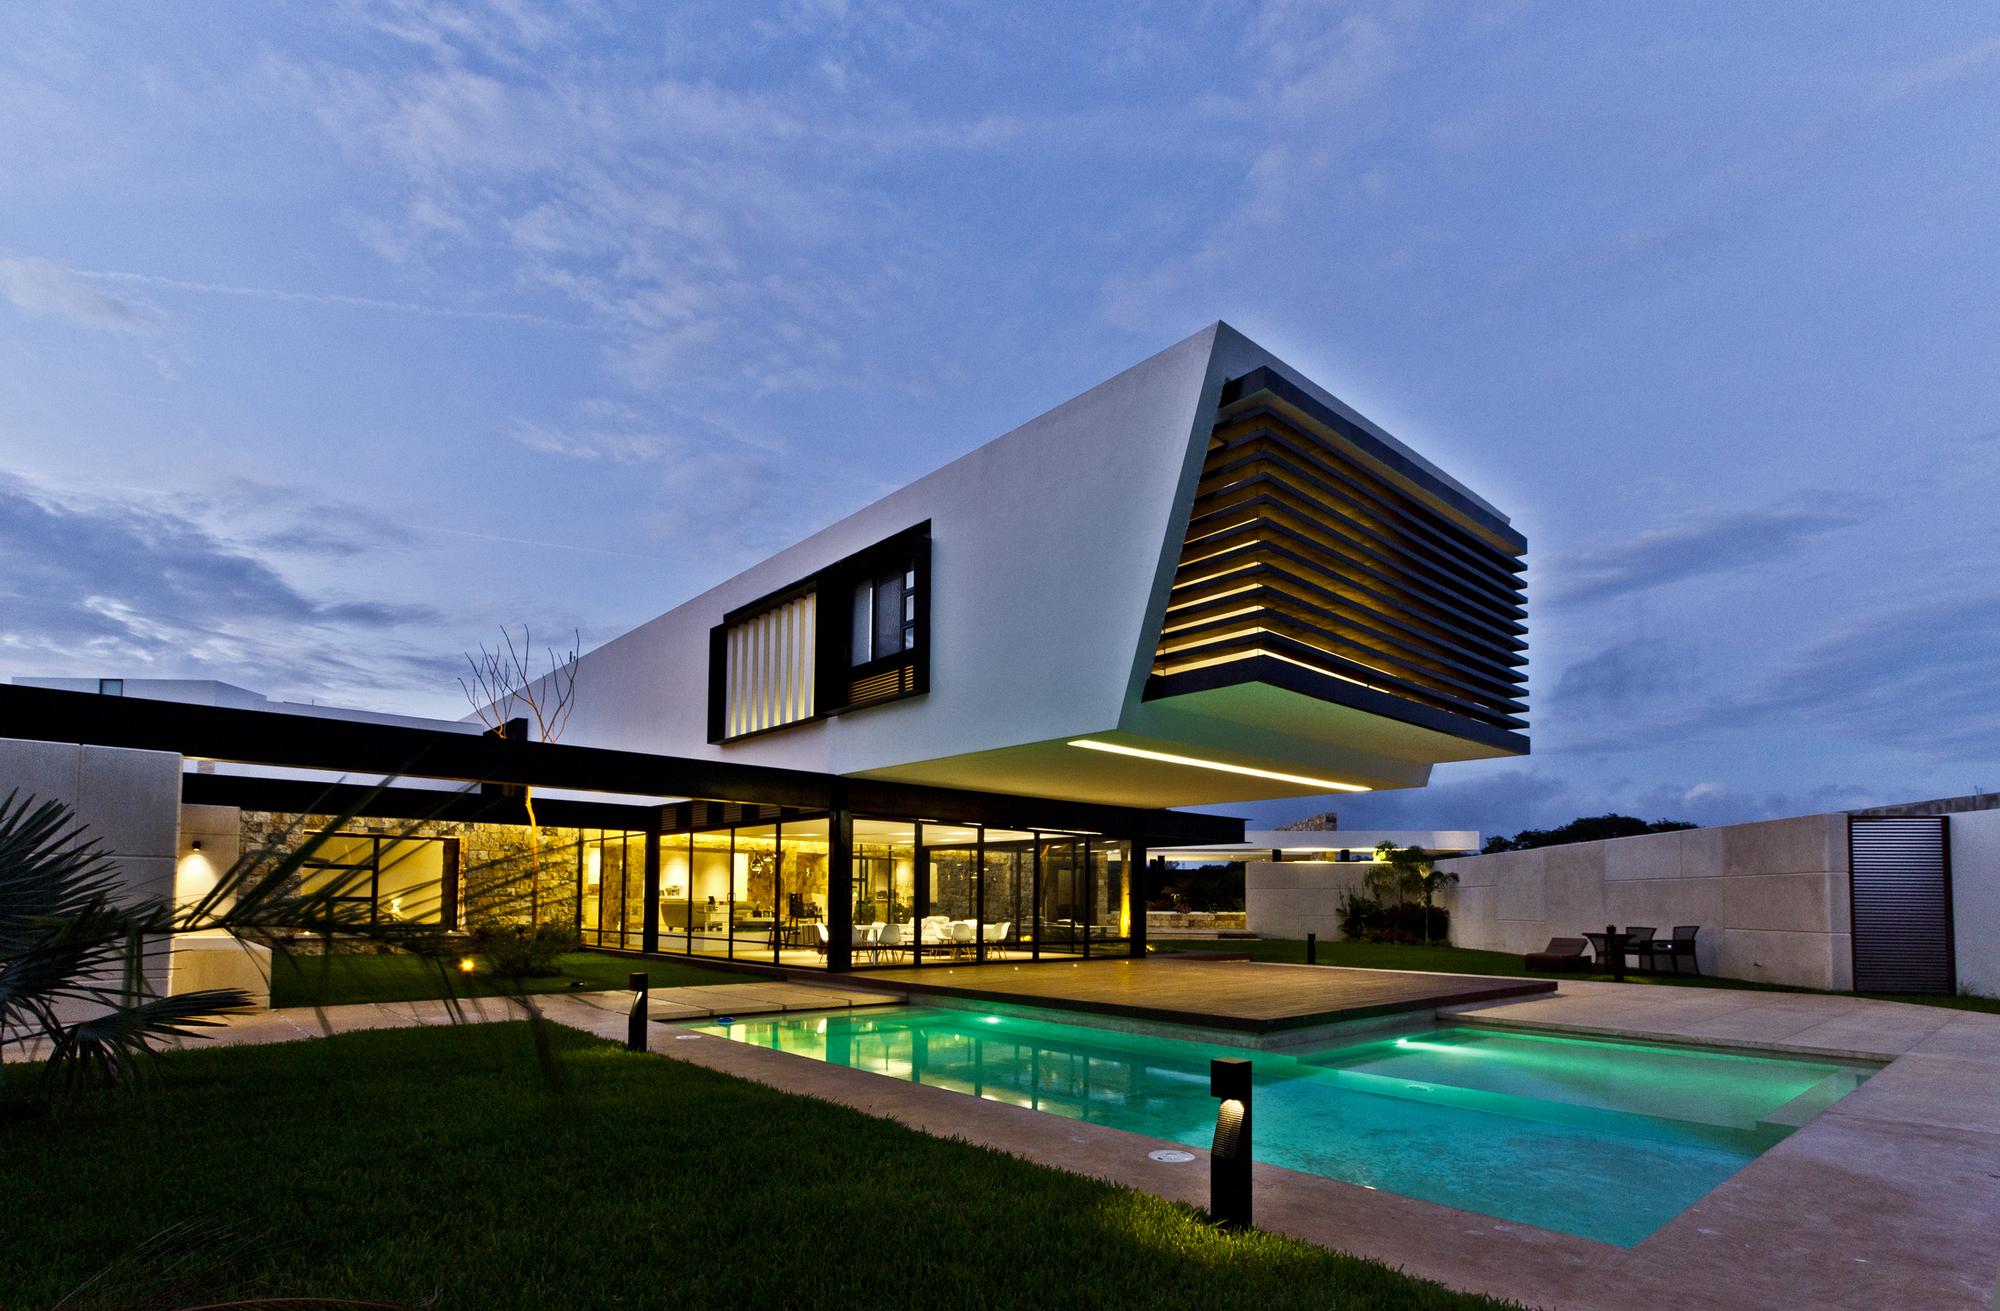 Contemporary-Comfort-At-The-Temozón-House-in-Yucatan-Mexico-4